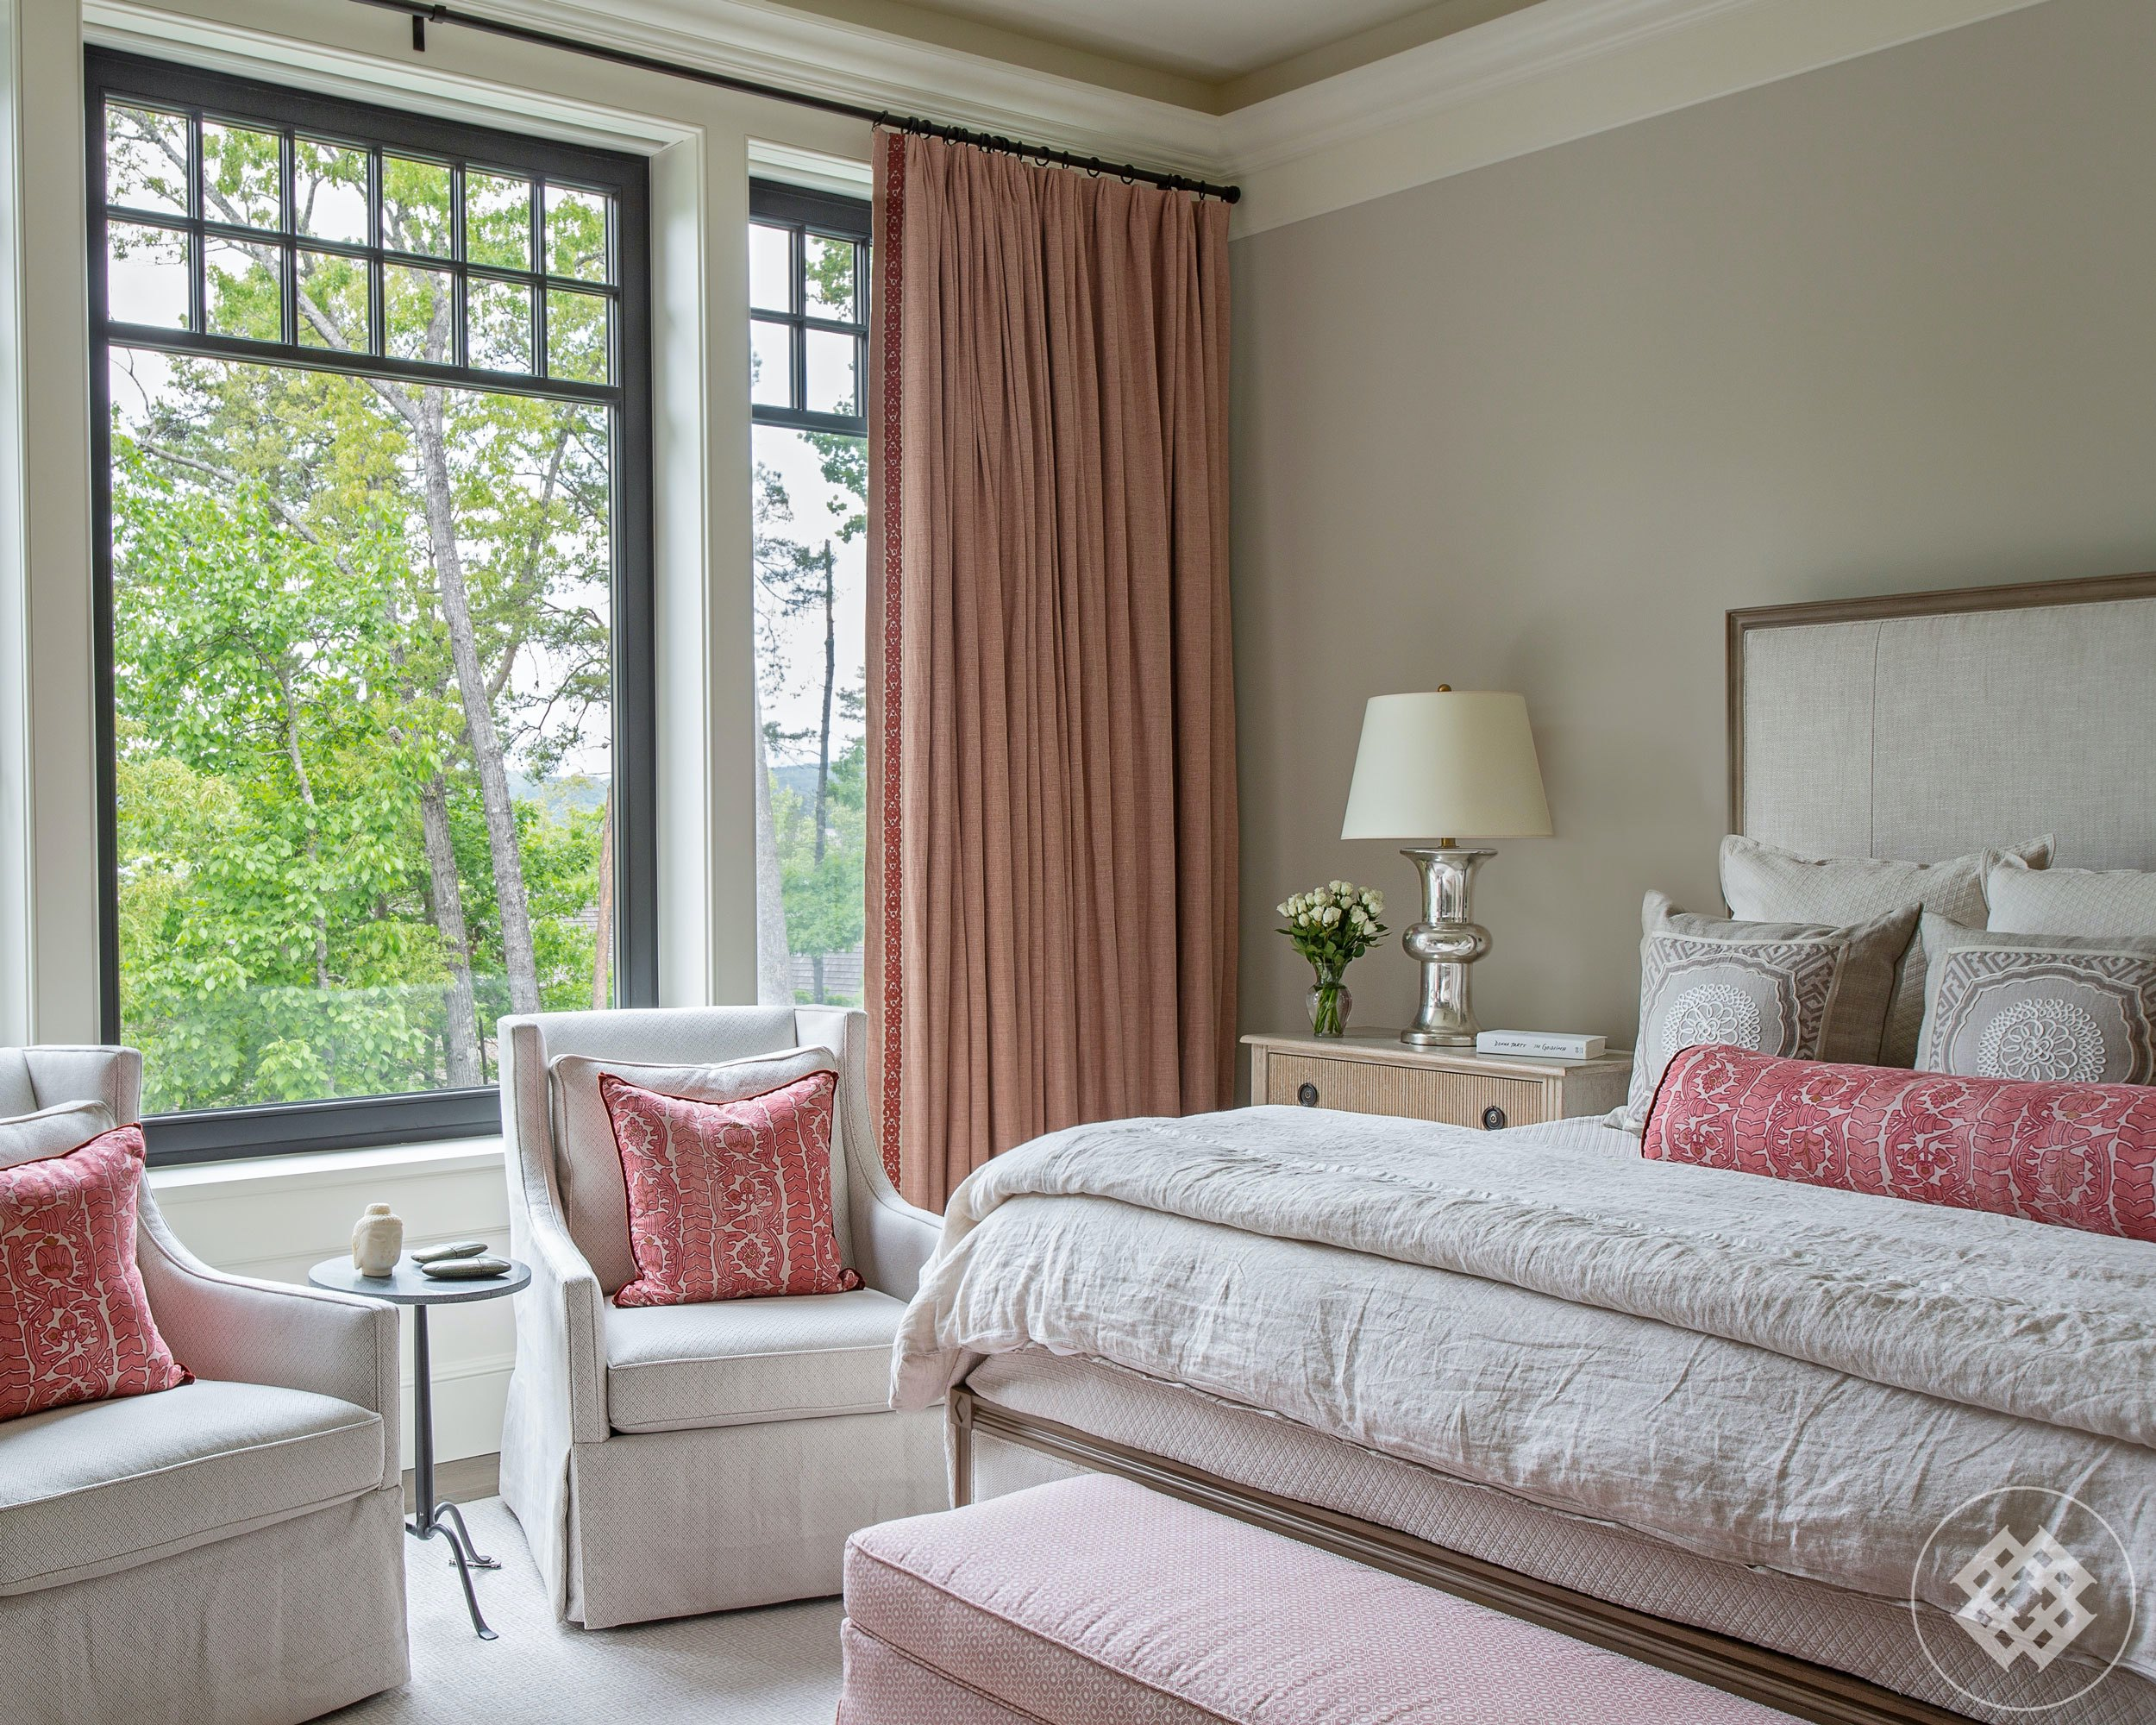 kkl-master-bedroom-with-custom-curtains-and-bedding.jpg